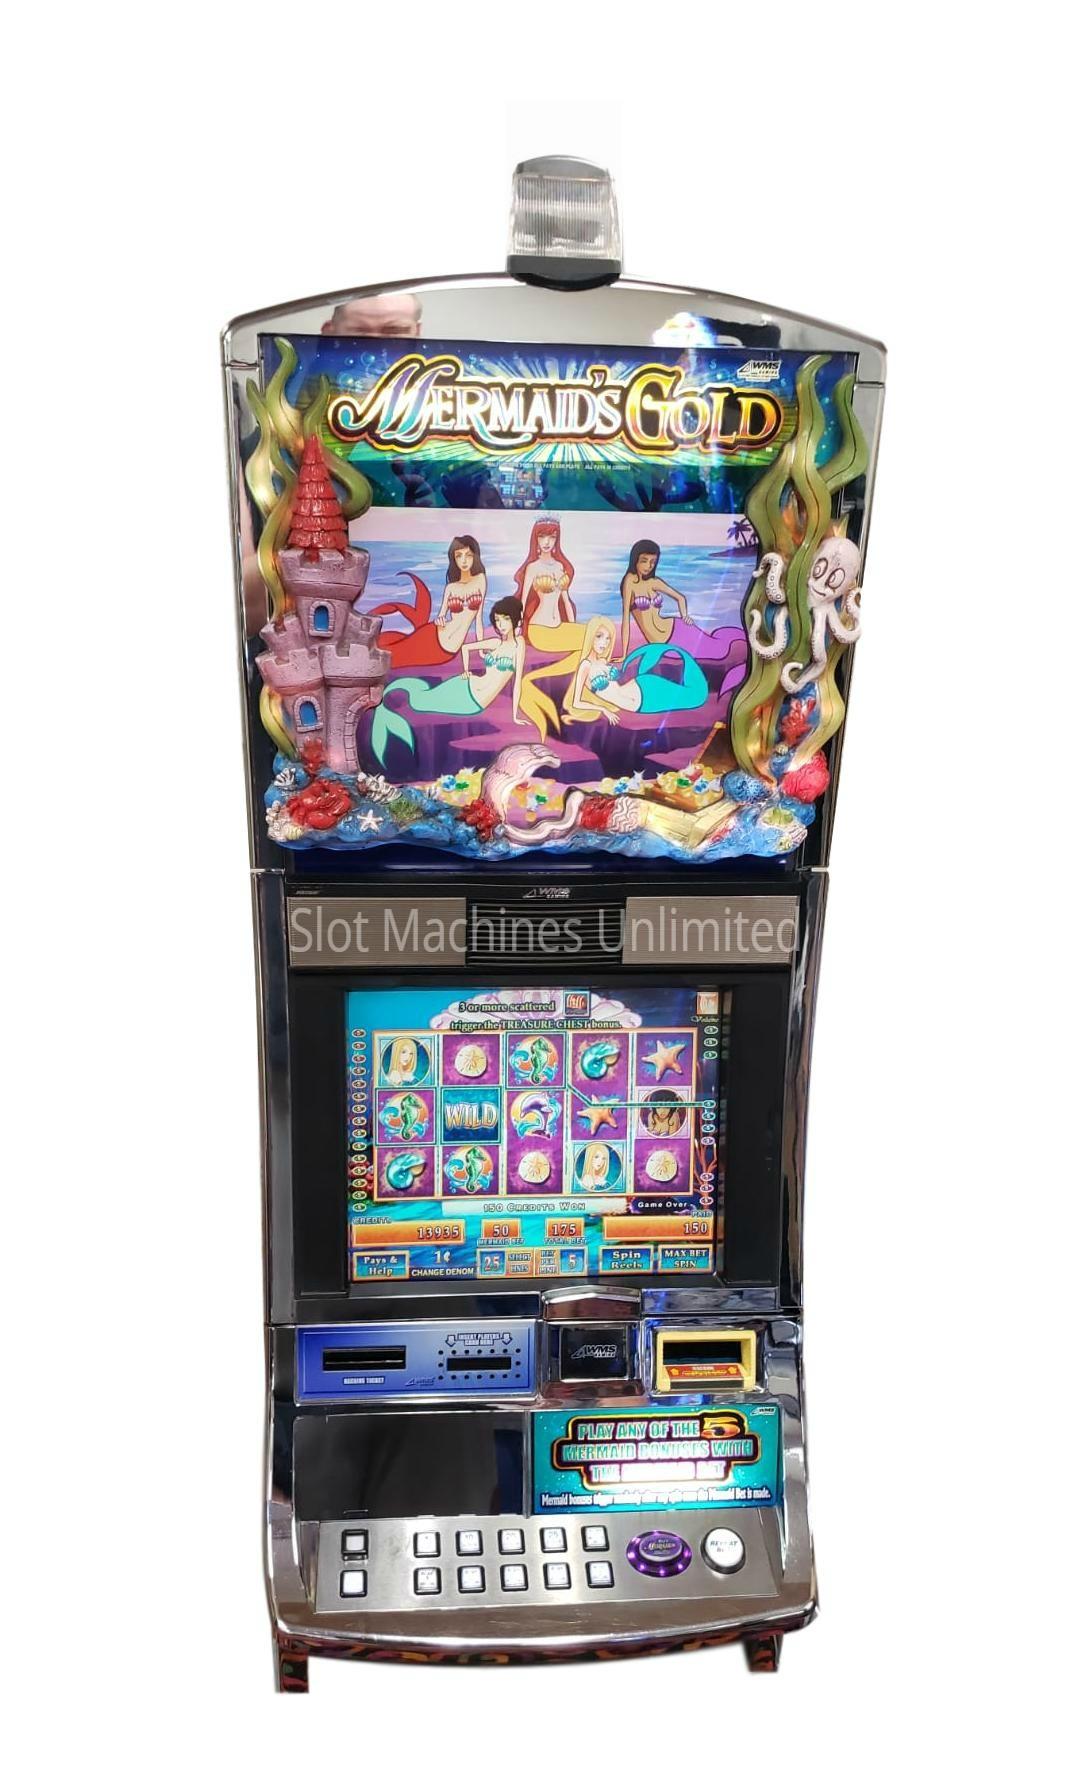 Vegas 7 slots